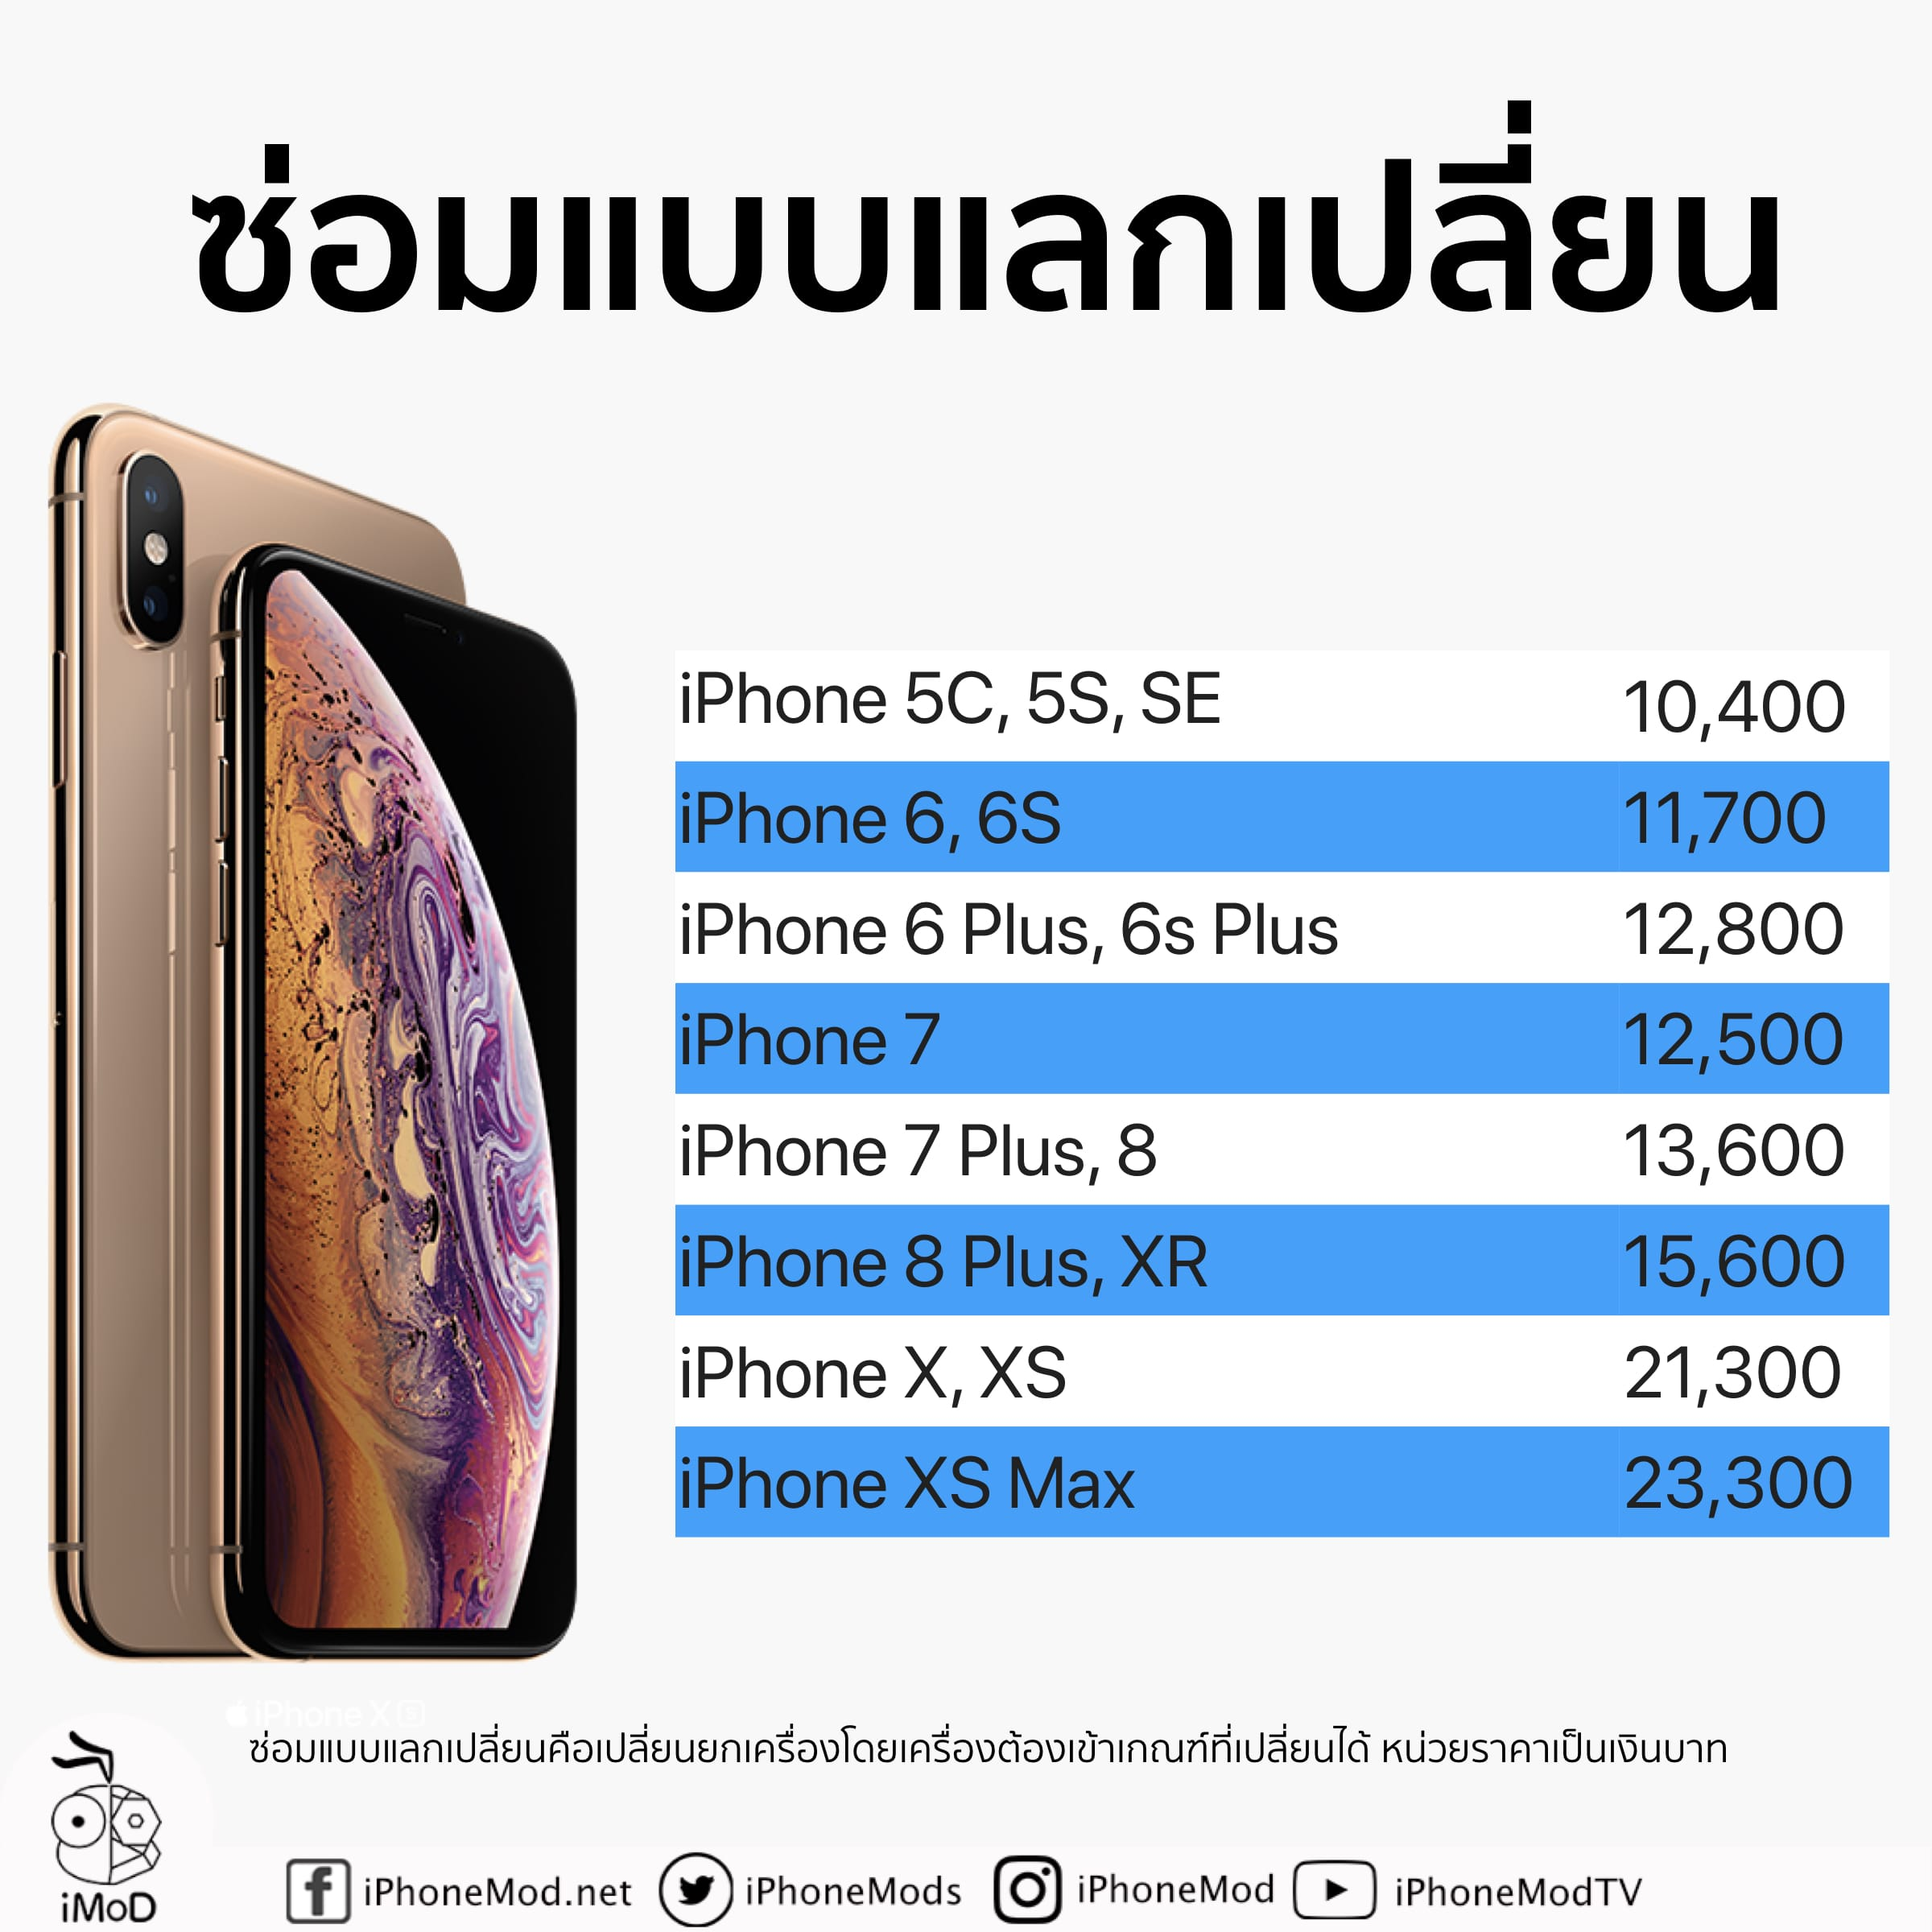 Aasp Thai Price Nov 2018 2